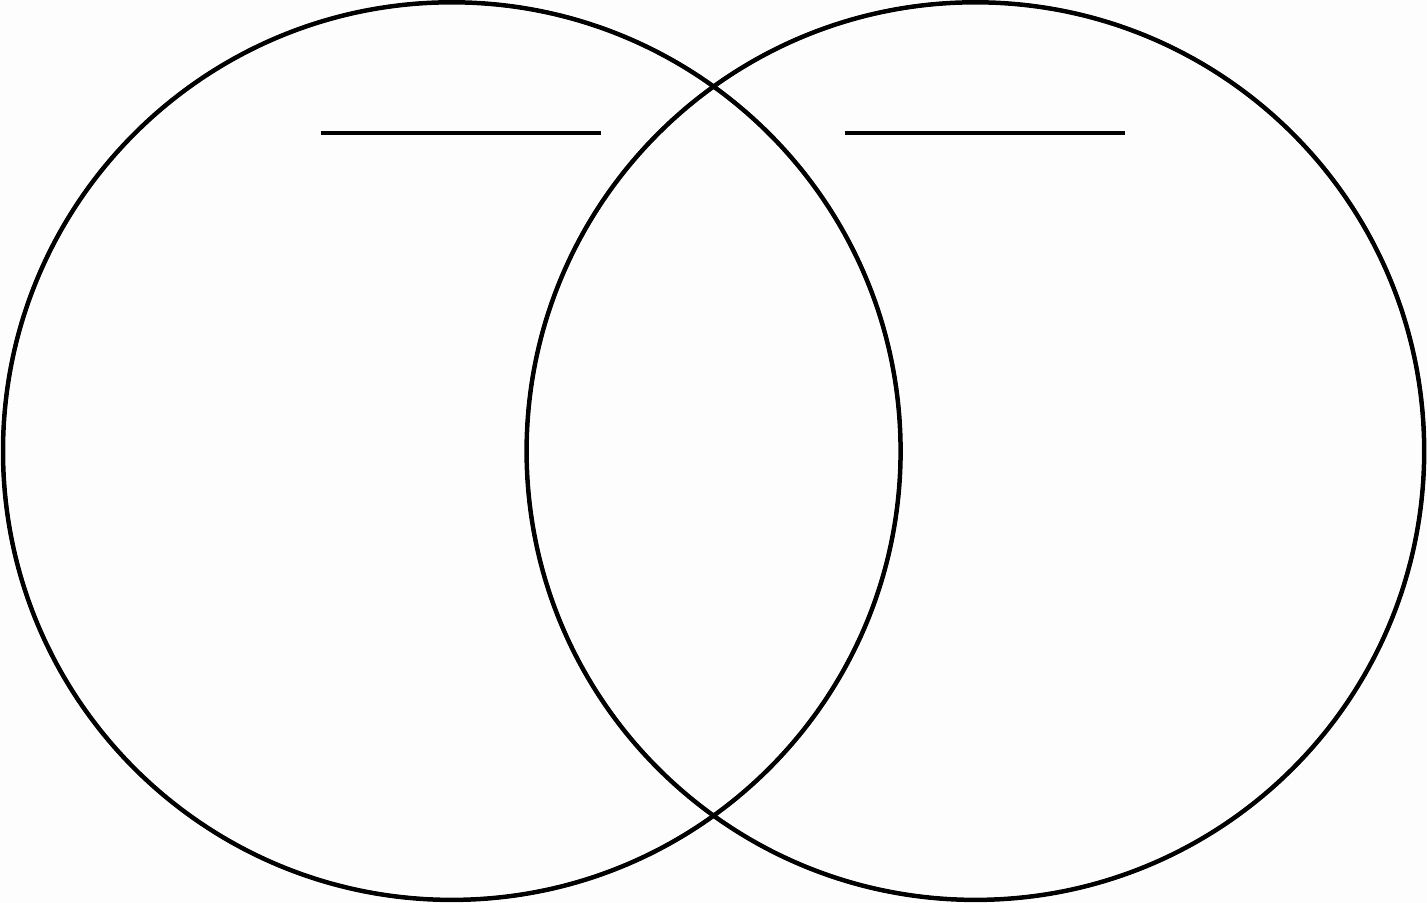 Venn Diagram Template Doc Unique Venn Diagram In Word And Pdf Formats Venn Diagram Template Venn Diagram Worksheet Venn Diagram Printable